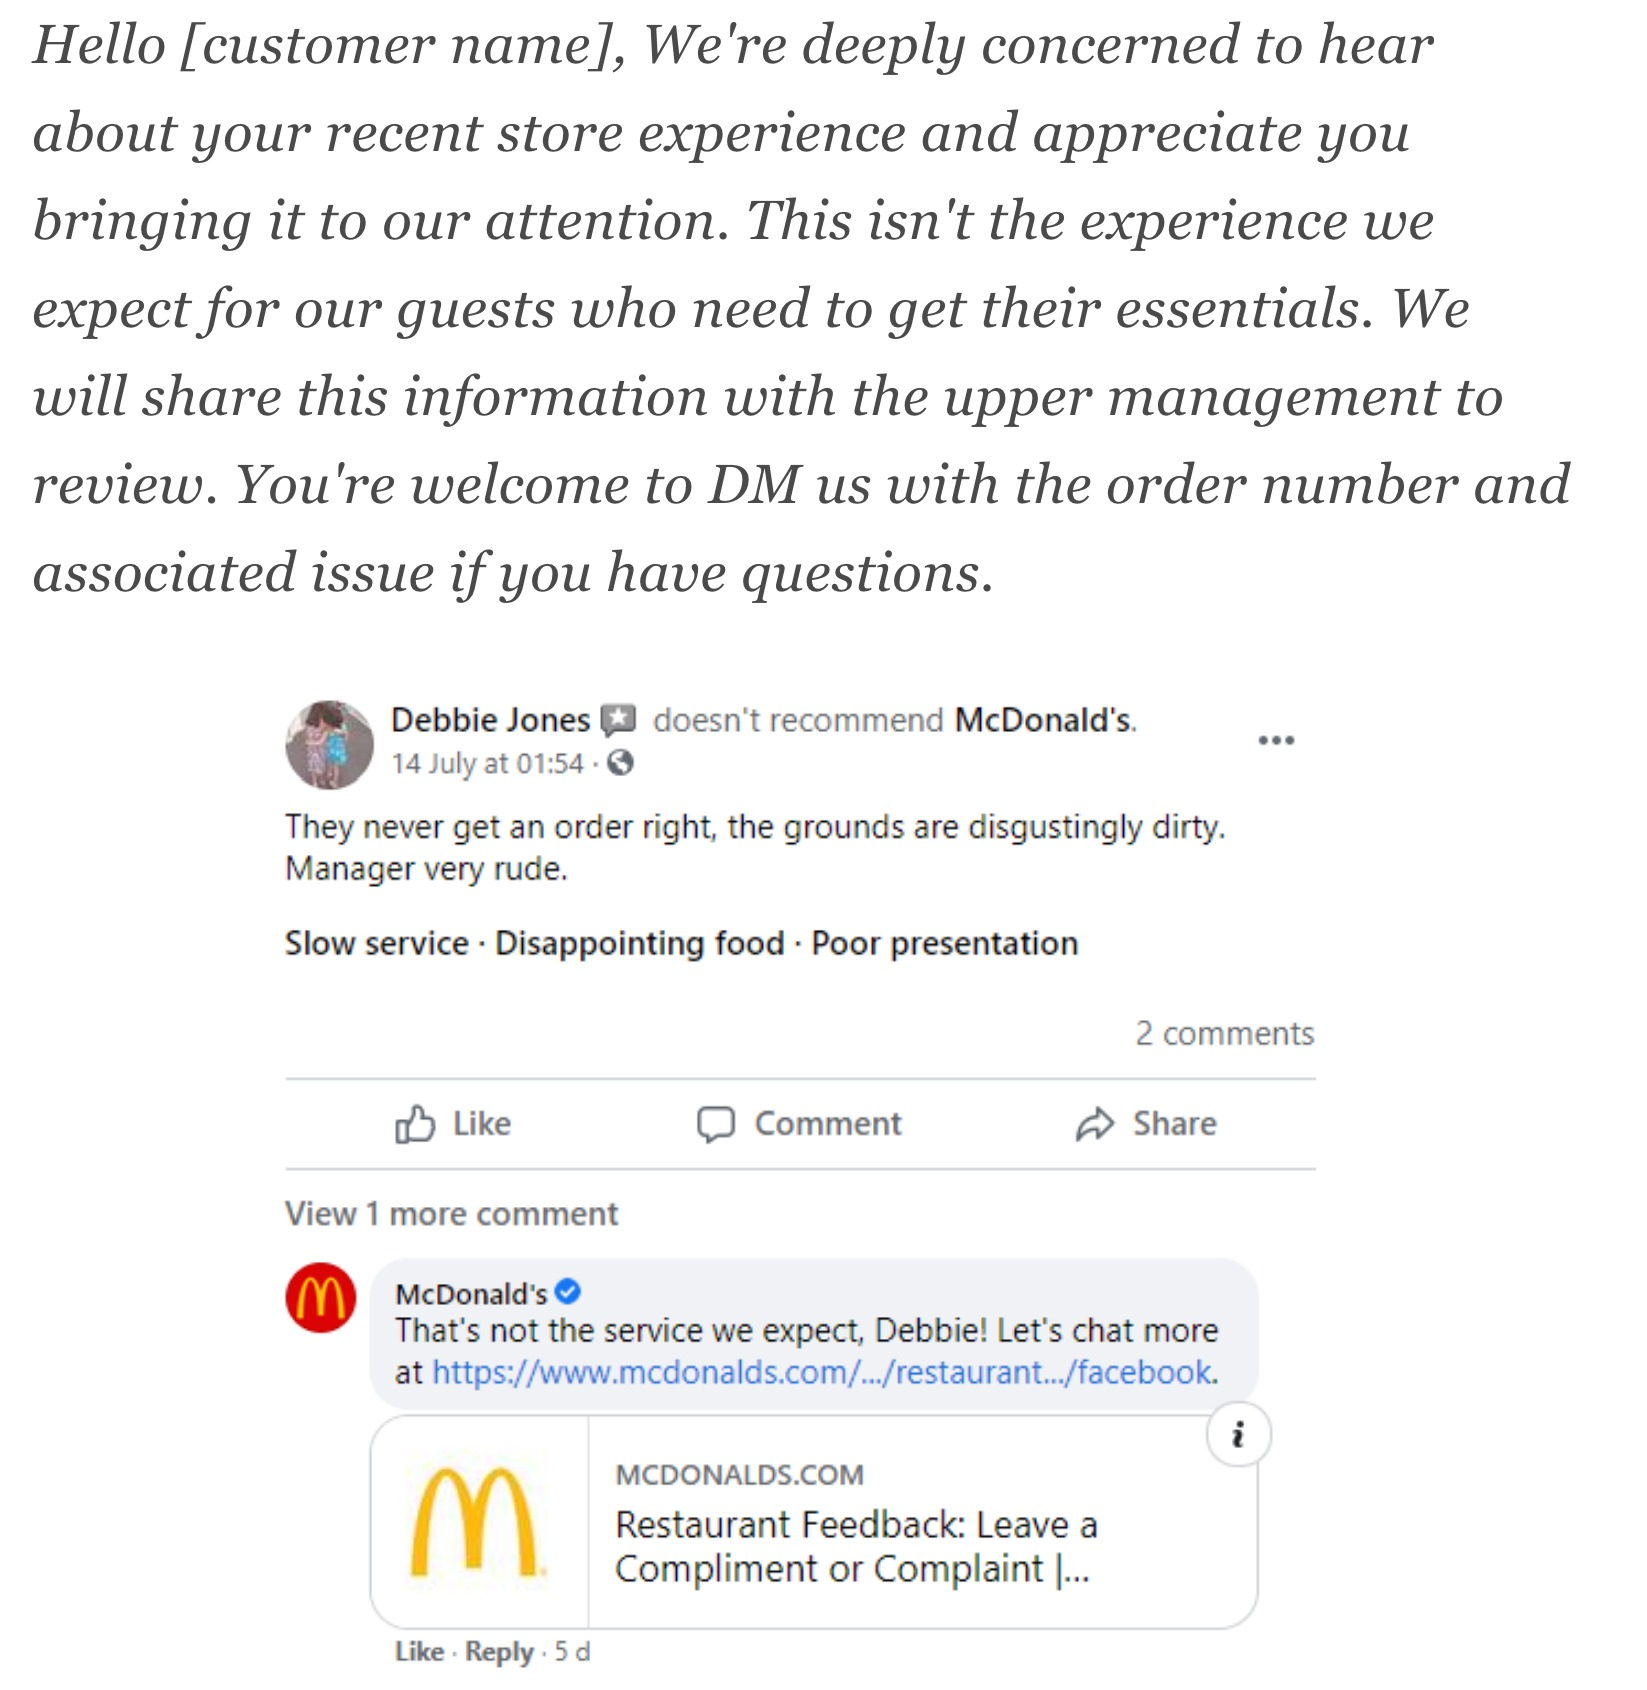 Source: https://statusbrew.com/insights/customer-service-scripts/ & https://www.facebook.com/McDonalds/